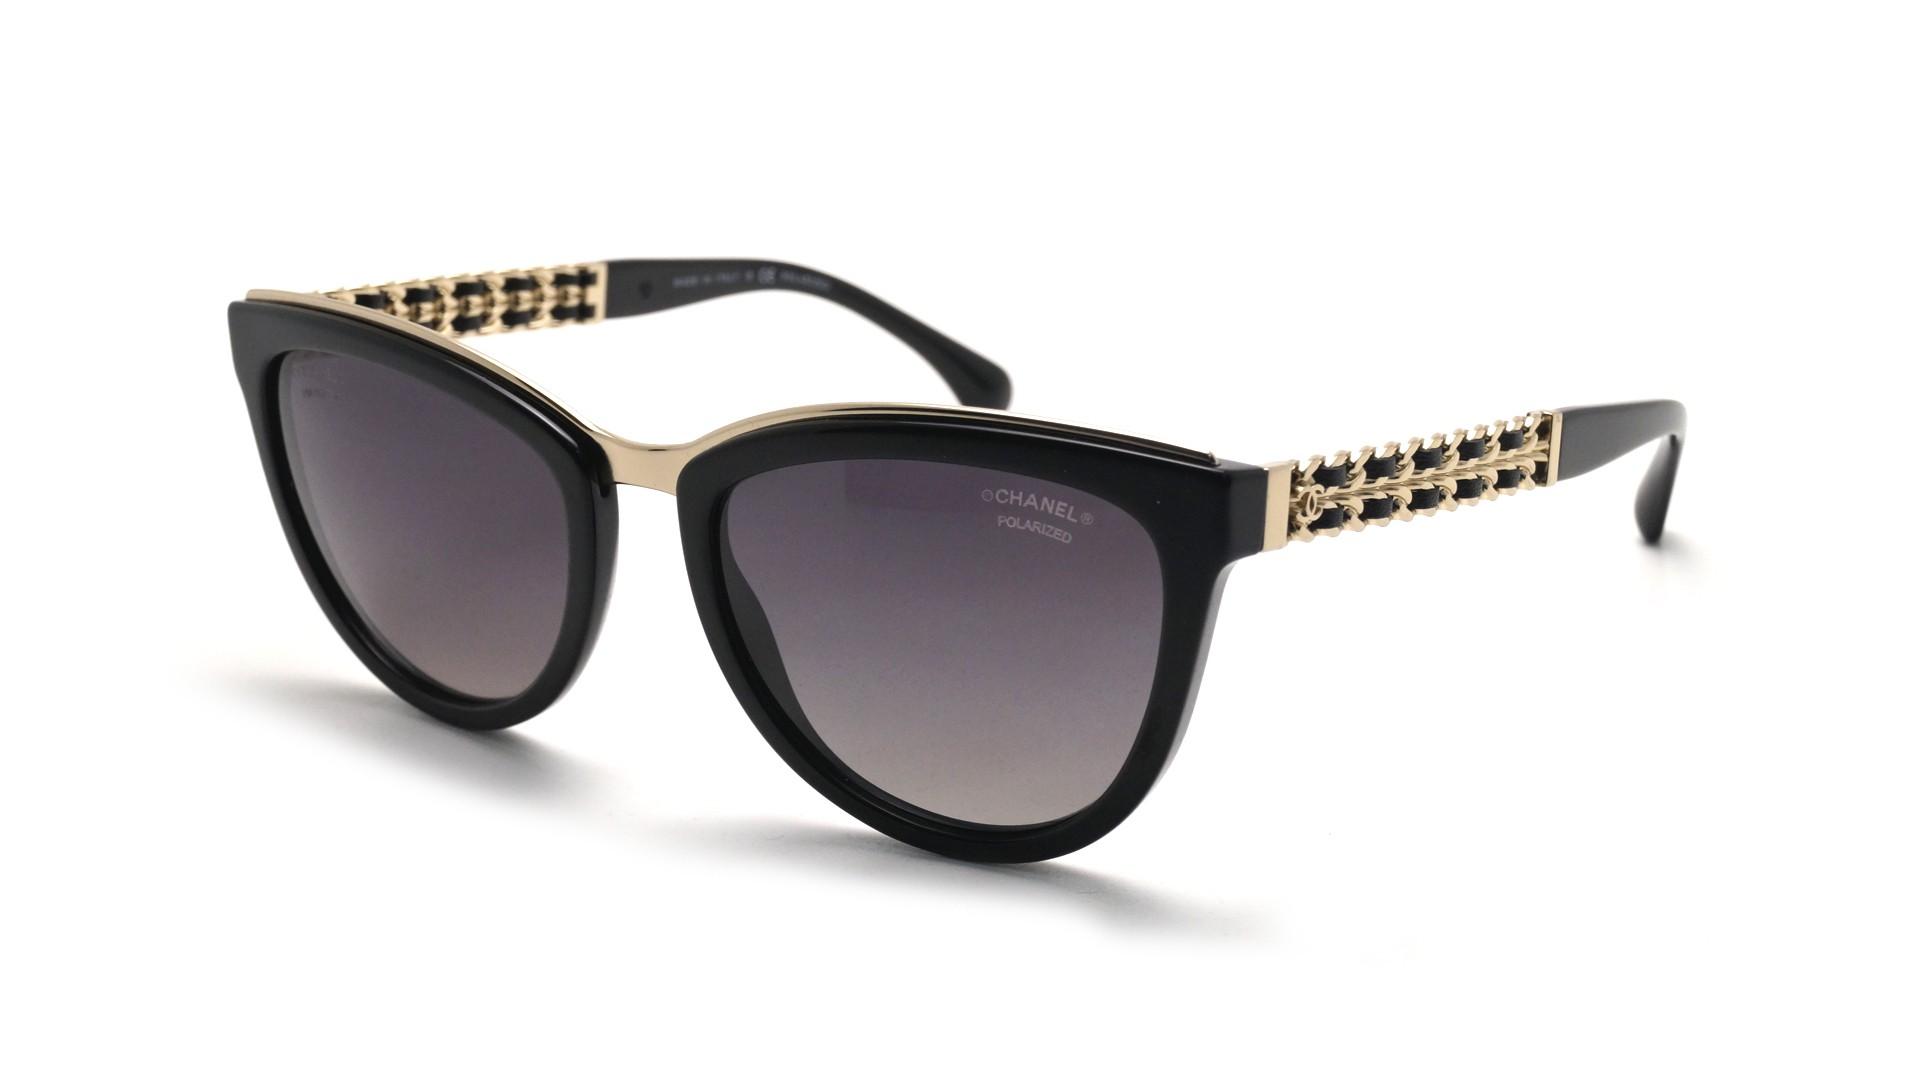 Chanel Erfly Acetate Sunglasses  cha?ne black ch5361q c501s8 55 19 polarized visiofactory